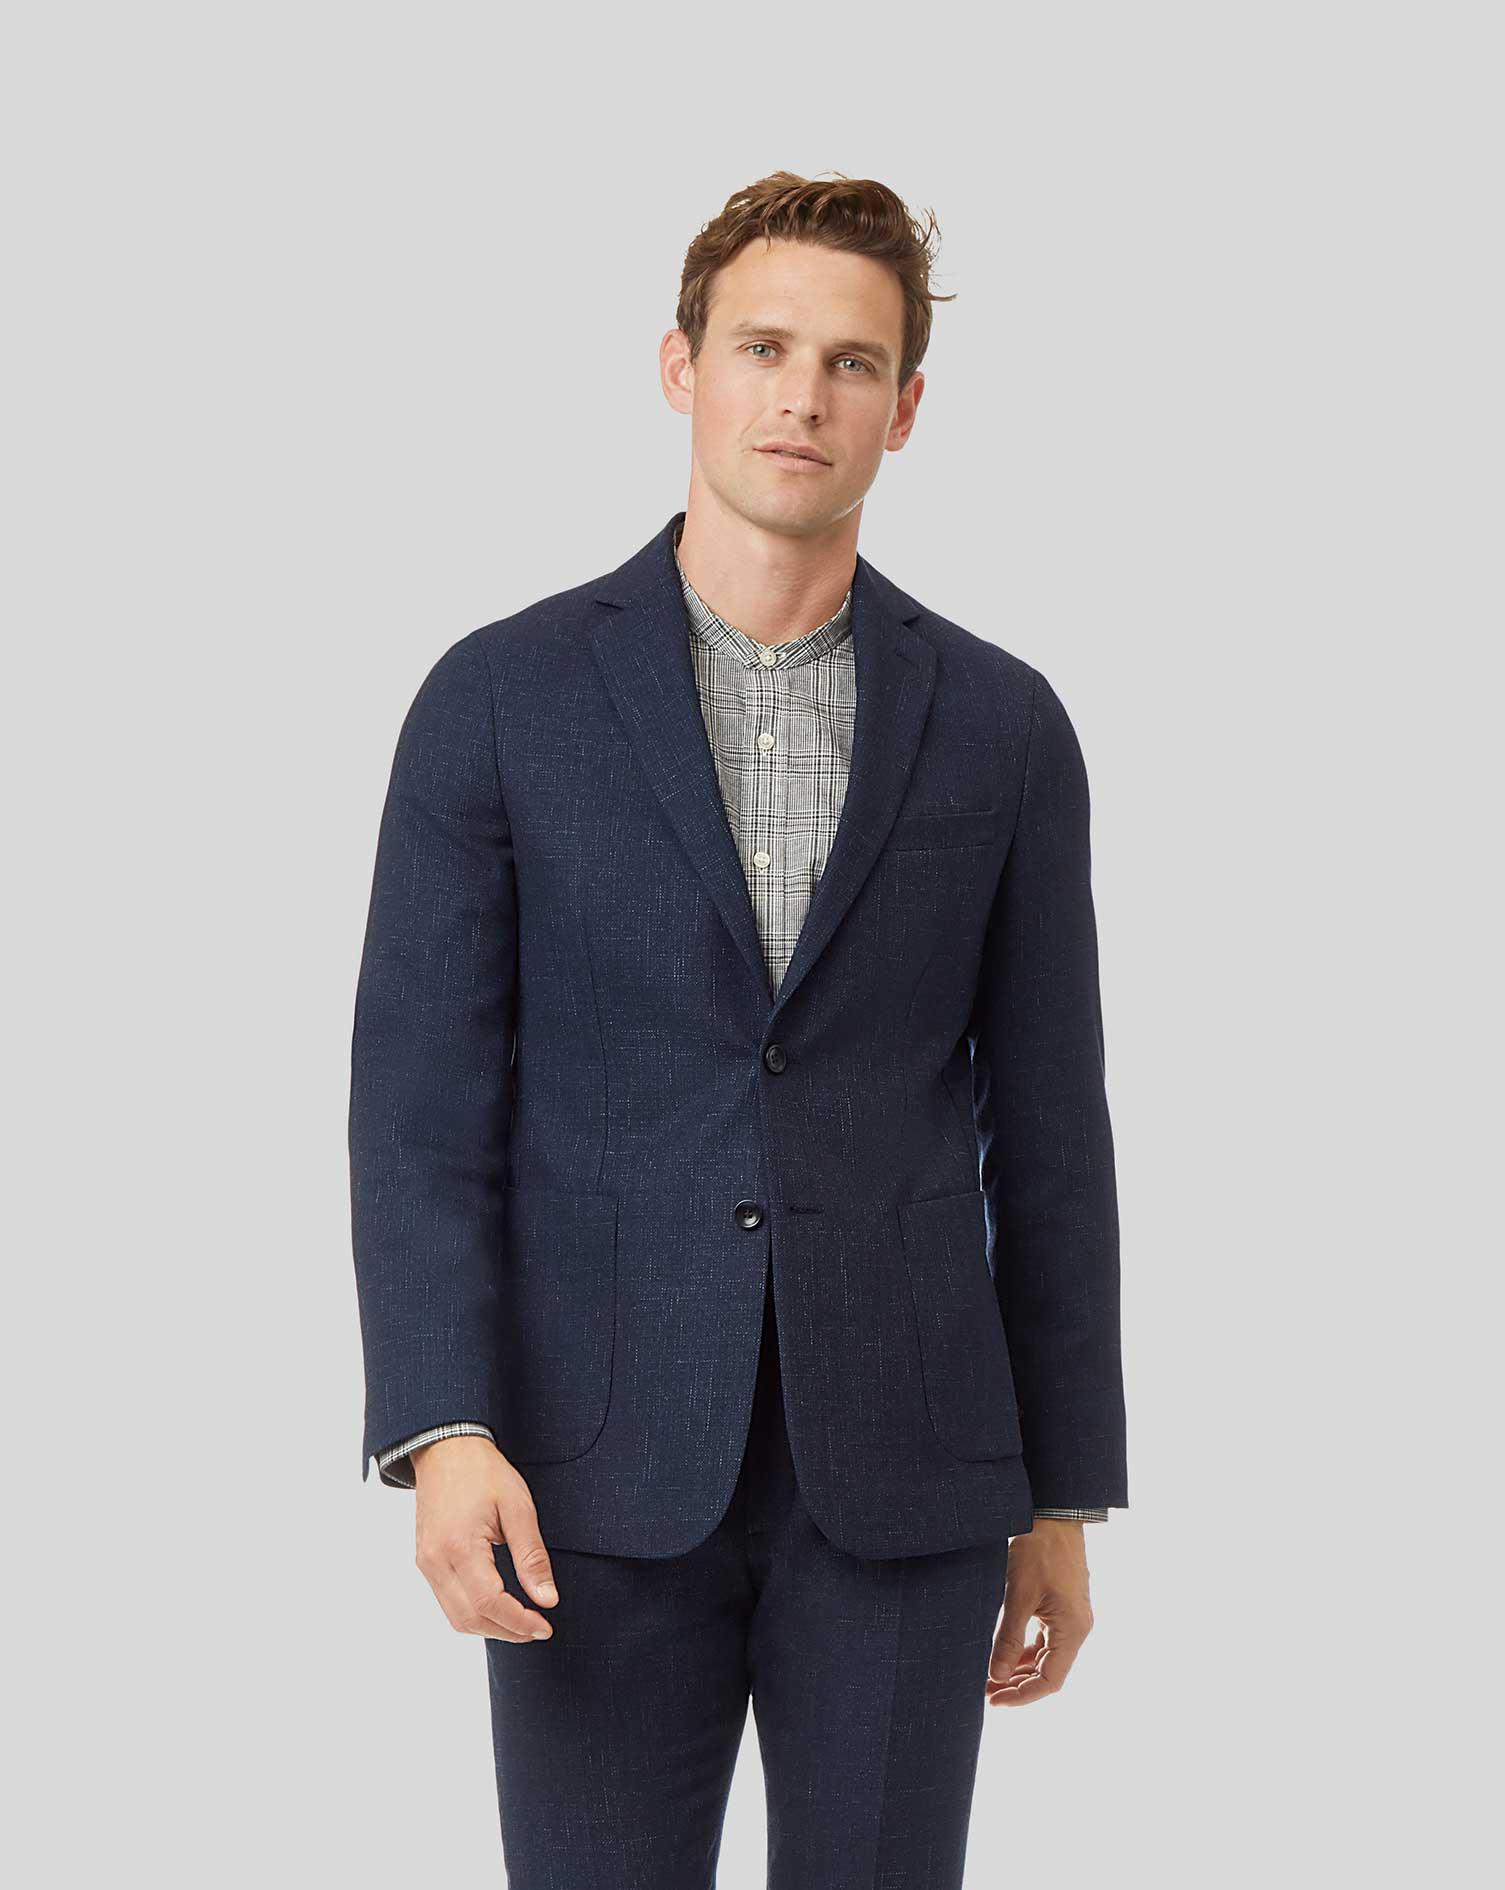 Cotton Textured Wool Blend Suit Jacket - Navy